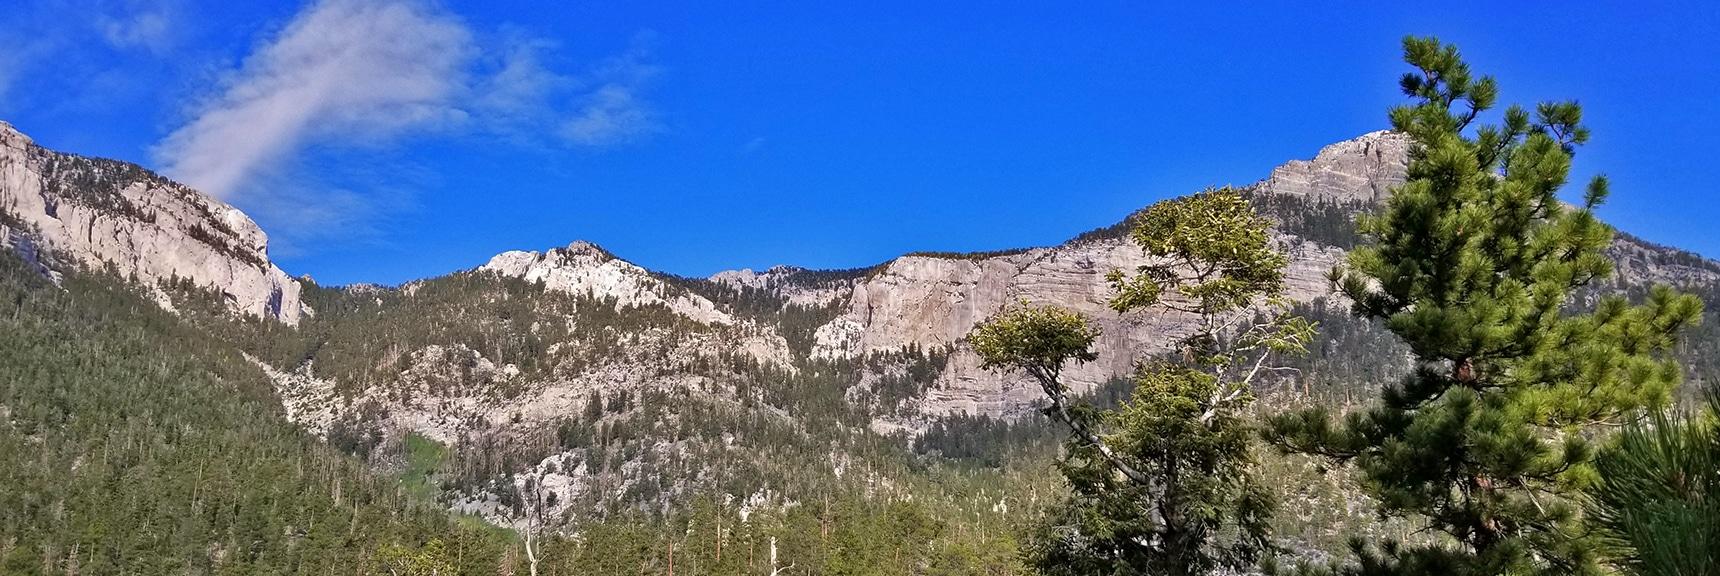 Looking Back at Mummy's Head Area for Climbing Route Ideas   Deer Creek Rd - Mummy Cliffs - Mummy Springs - Raintree - Fletcher Peak - Cougar Ridge Trail Circuit   Mt Charleston Wilderness   Spring Mountains, Nevada